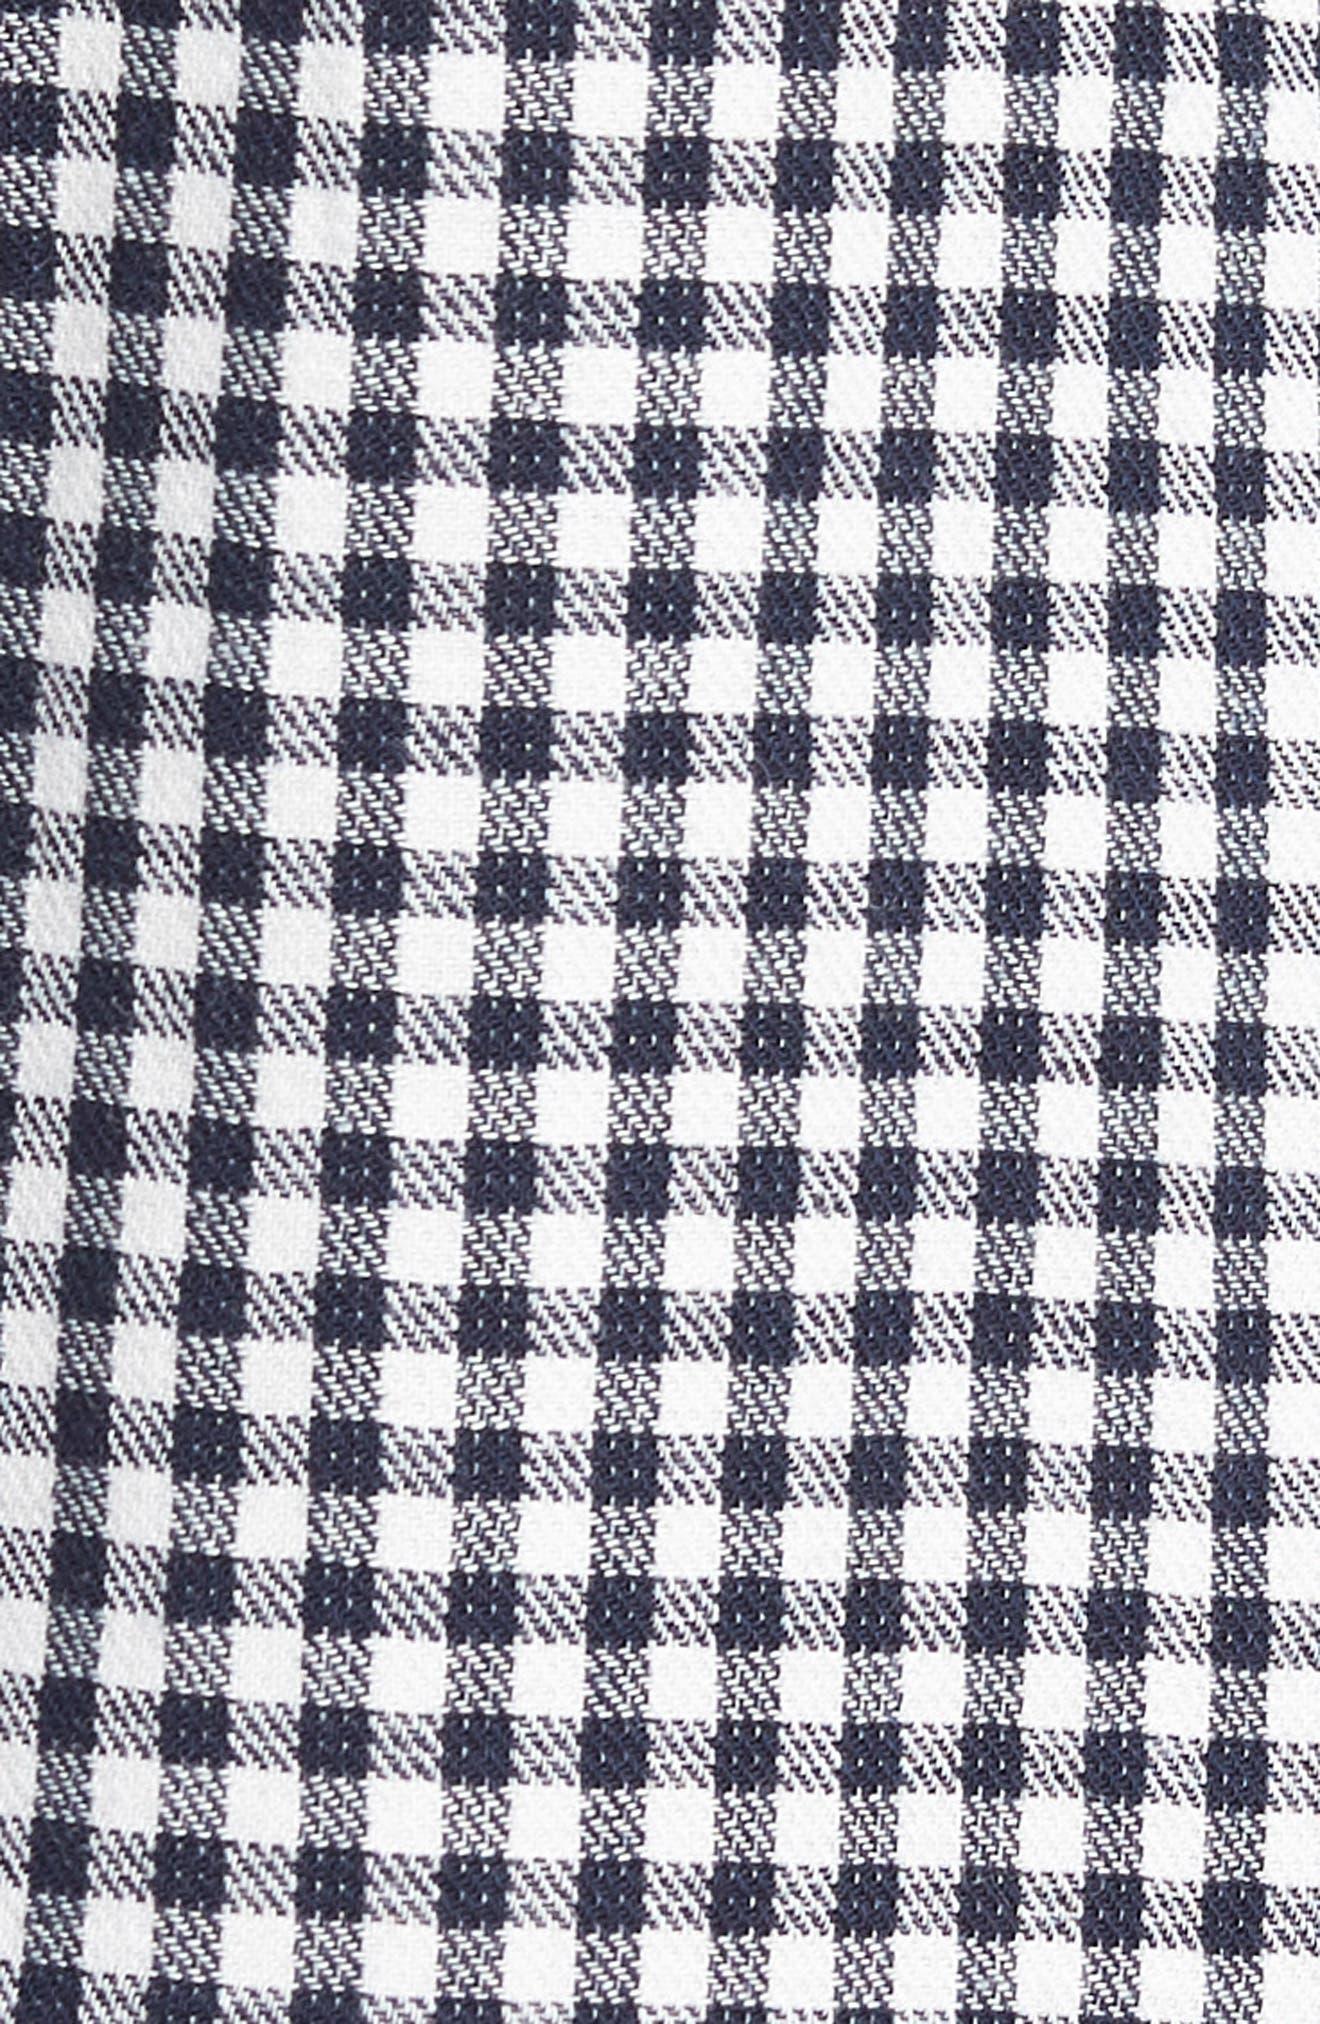 Fit 2 Tomlin Check Sport Shirt,                             Alternate thumbnail 5, color,                             NAVY GINGHAM